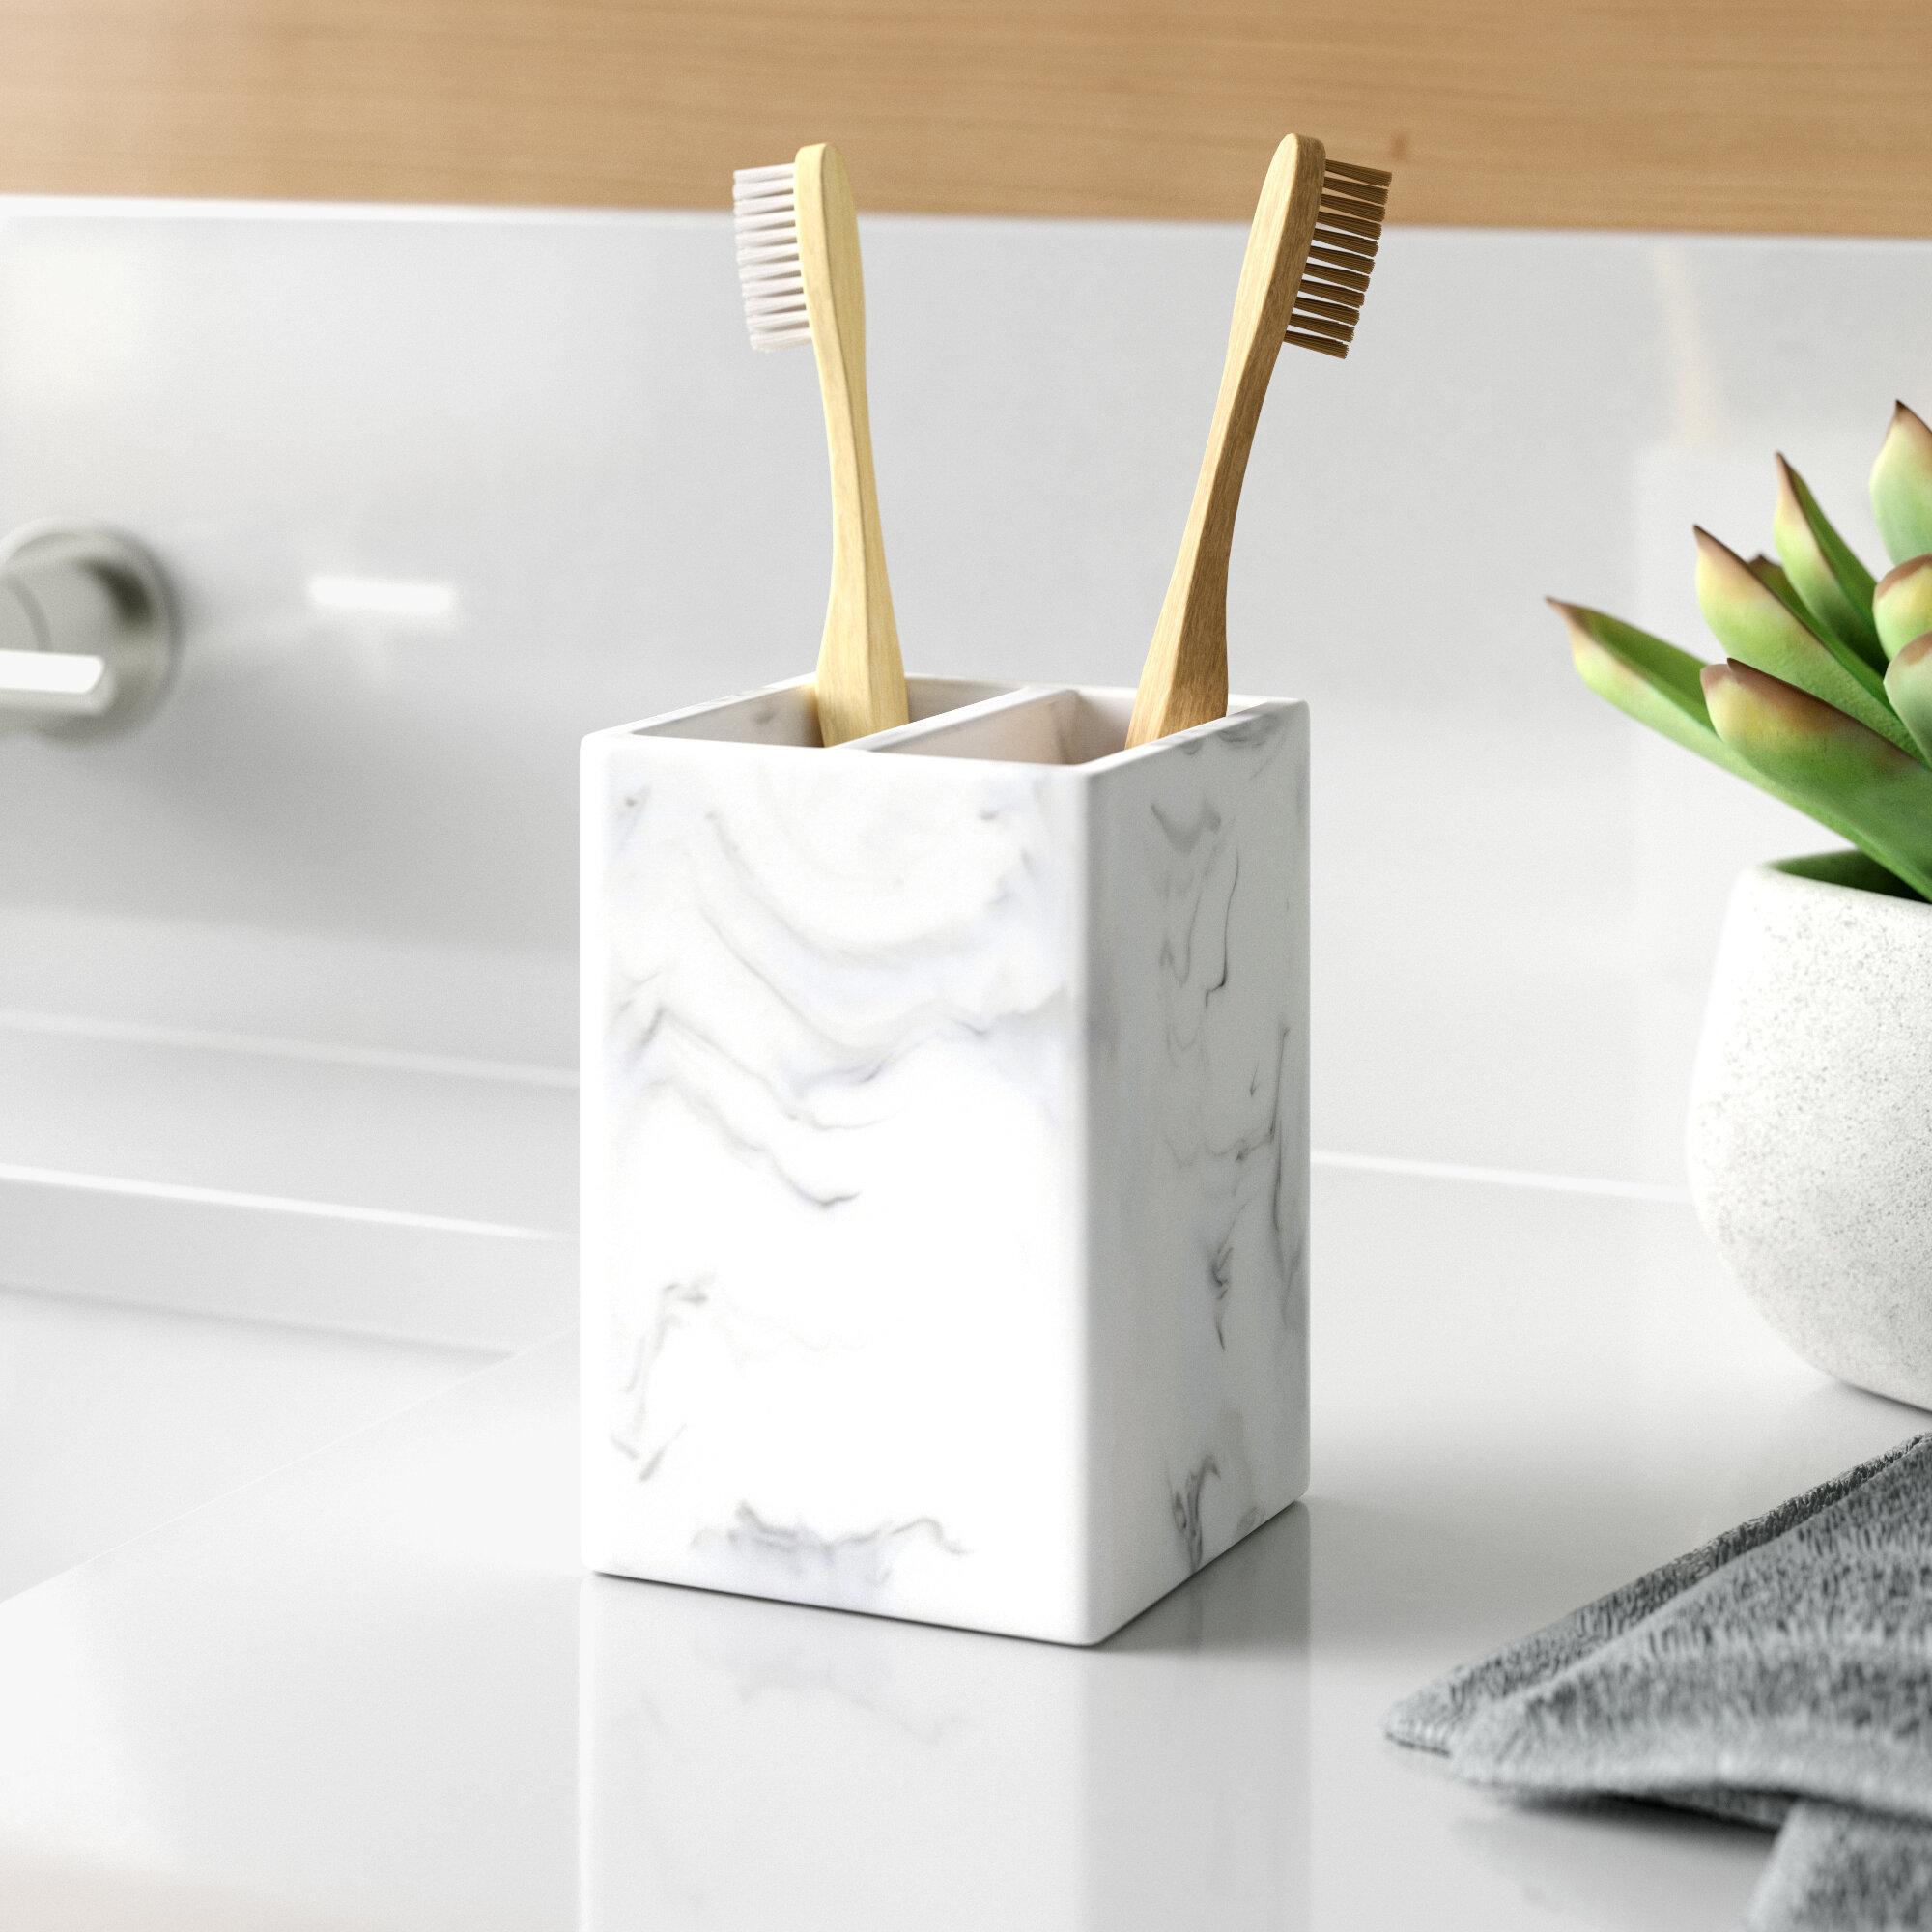 Dotted Line Funke Poly Resin Toothbrush Holder Reviews Wayfair